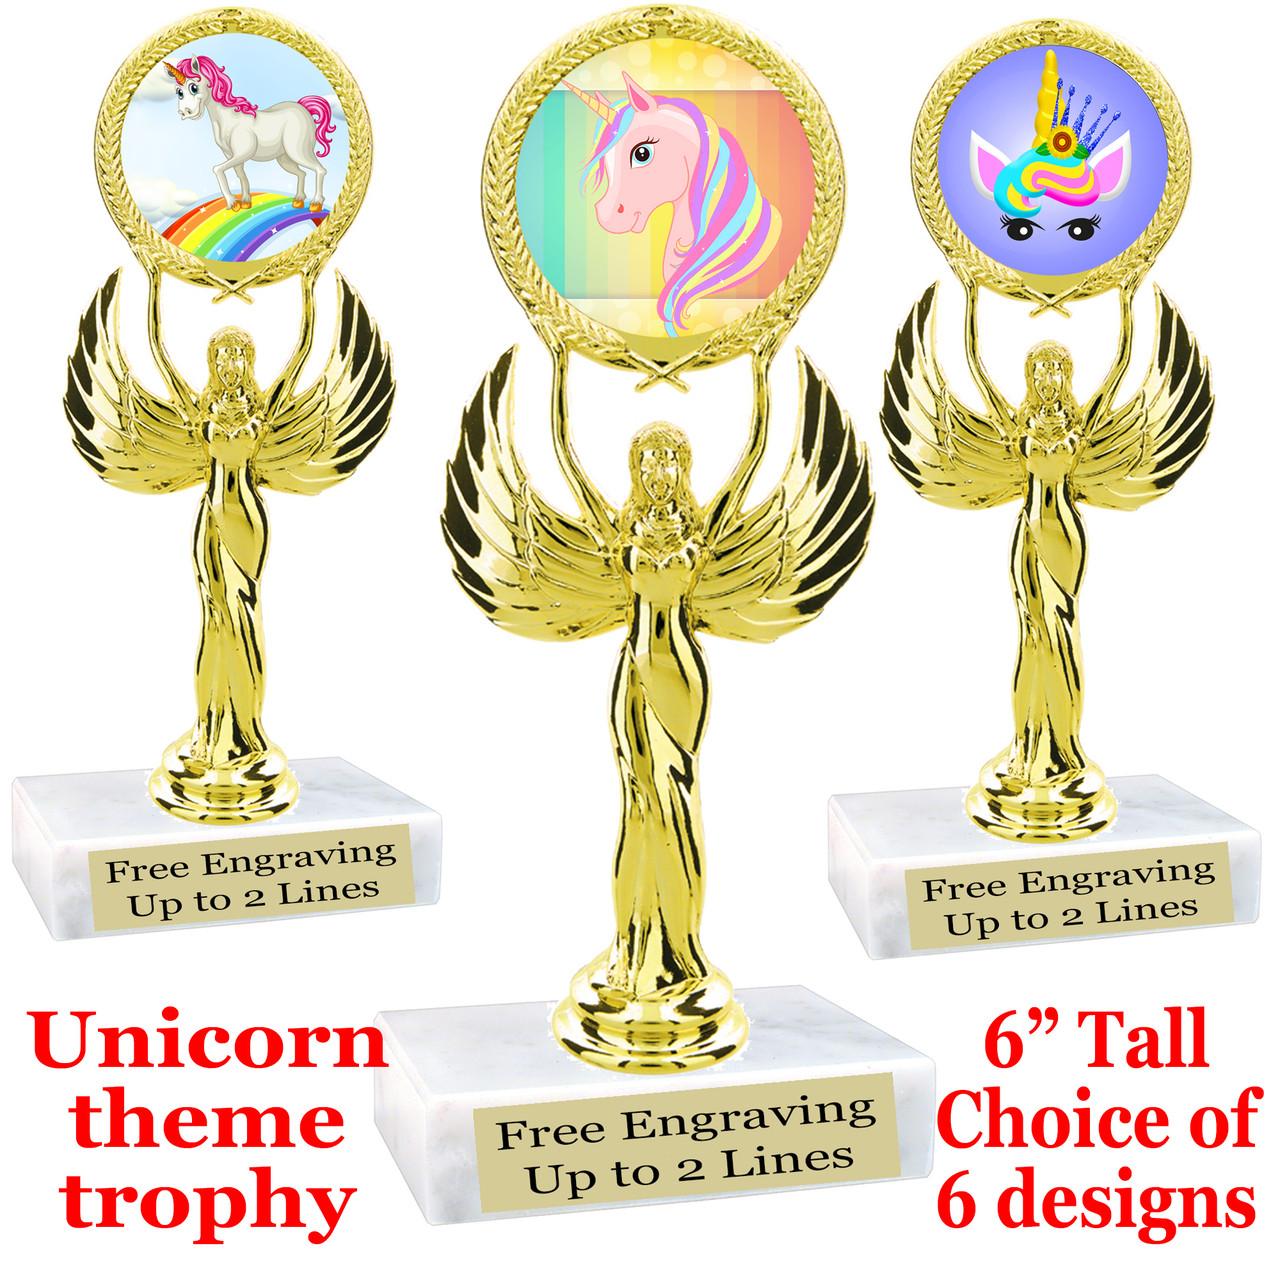 Unicorn theme trophy 6 tall trophy with unicorn art work.